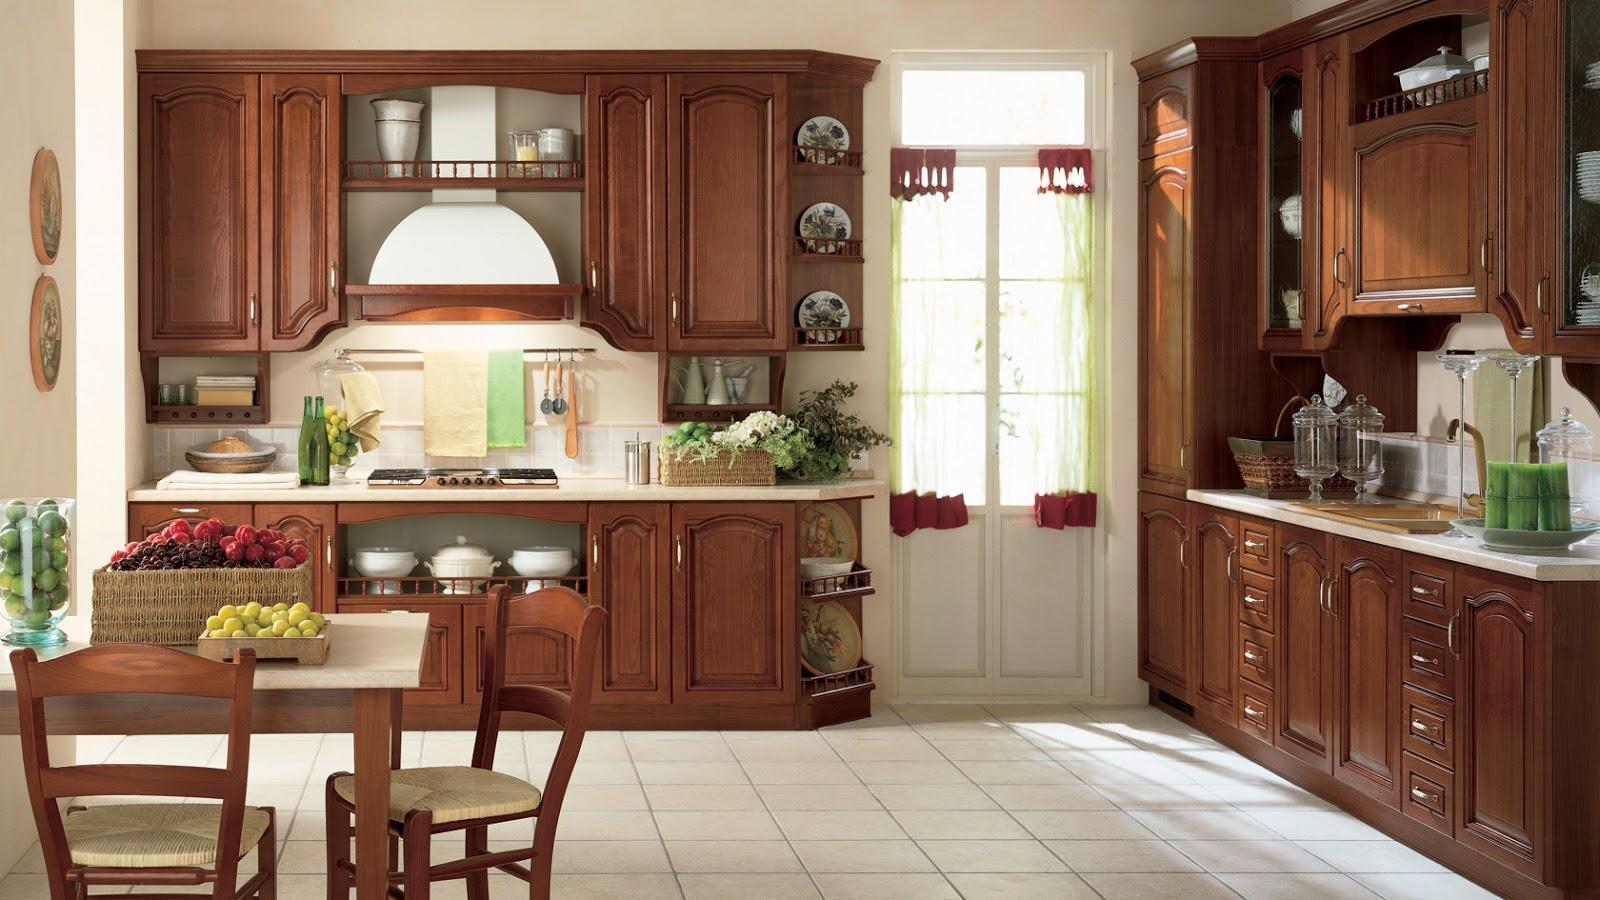 Cucine classiche for Immagini cucine